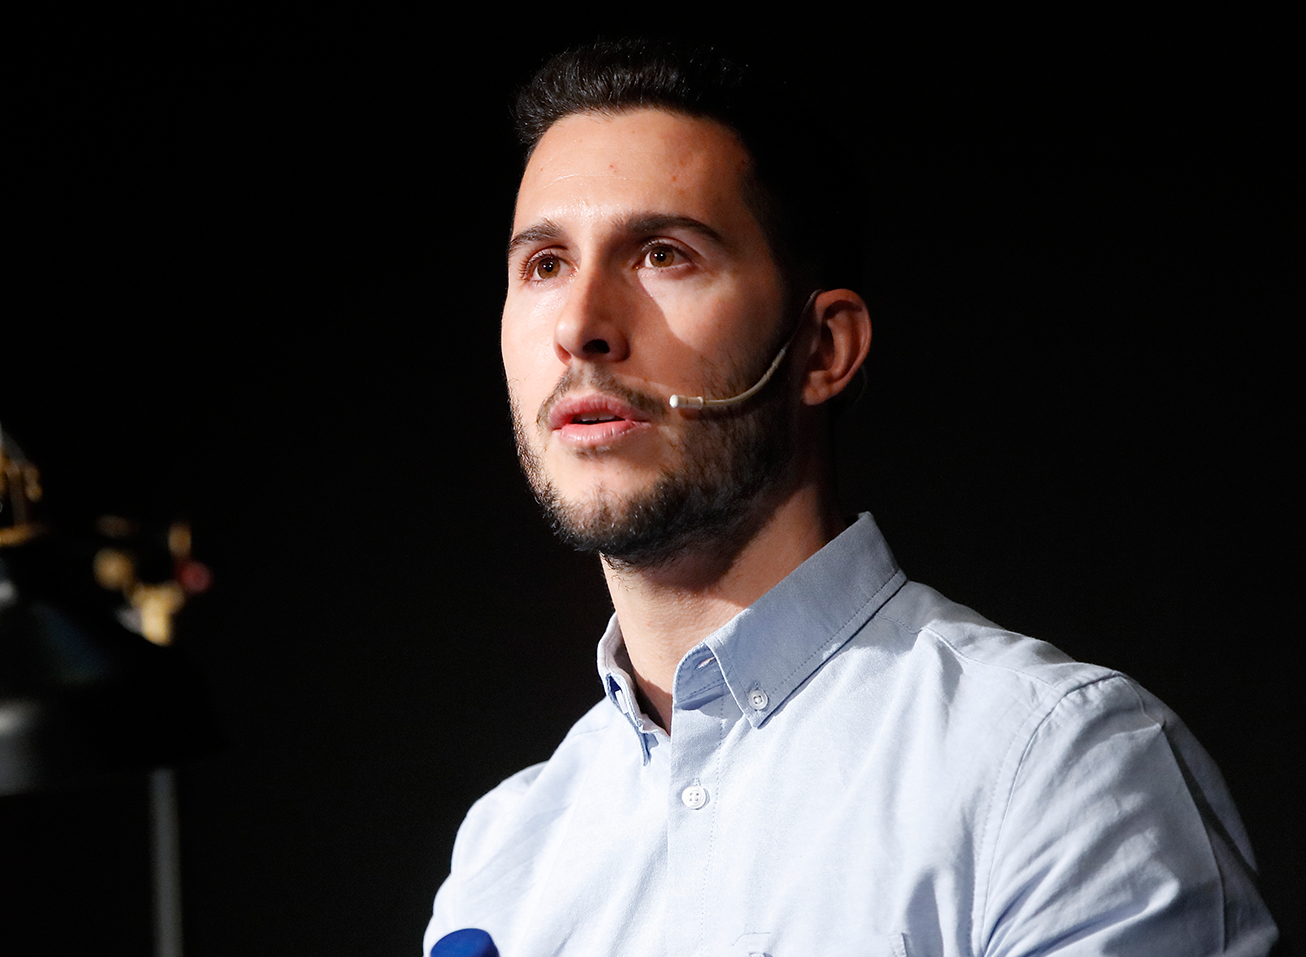 Daniel-Núñez